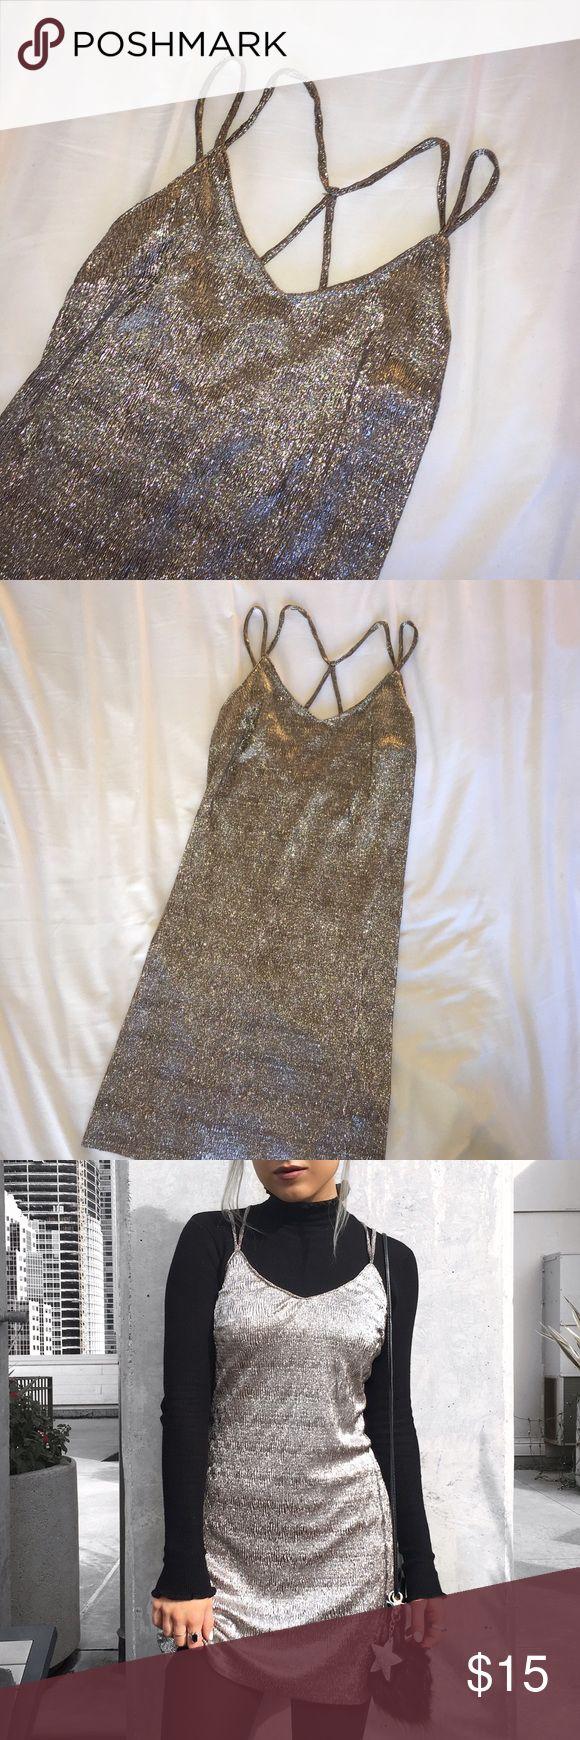 Ardene metallic mini dress Adorable metallic silvery pink tank mini dress by Ardene, stretchy fabric, size small, worn once, NO TRADES ardene Dresses Mini